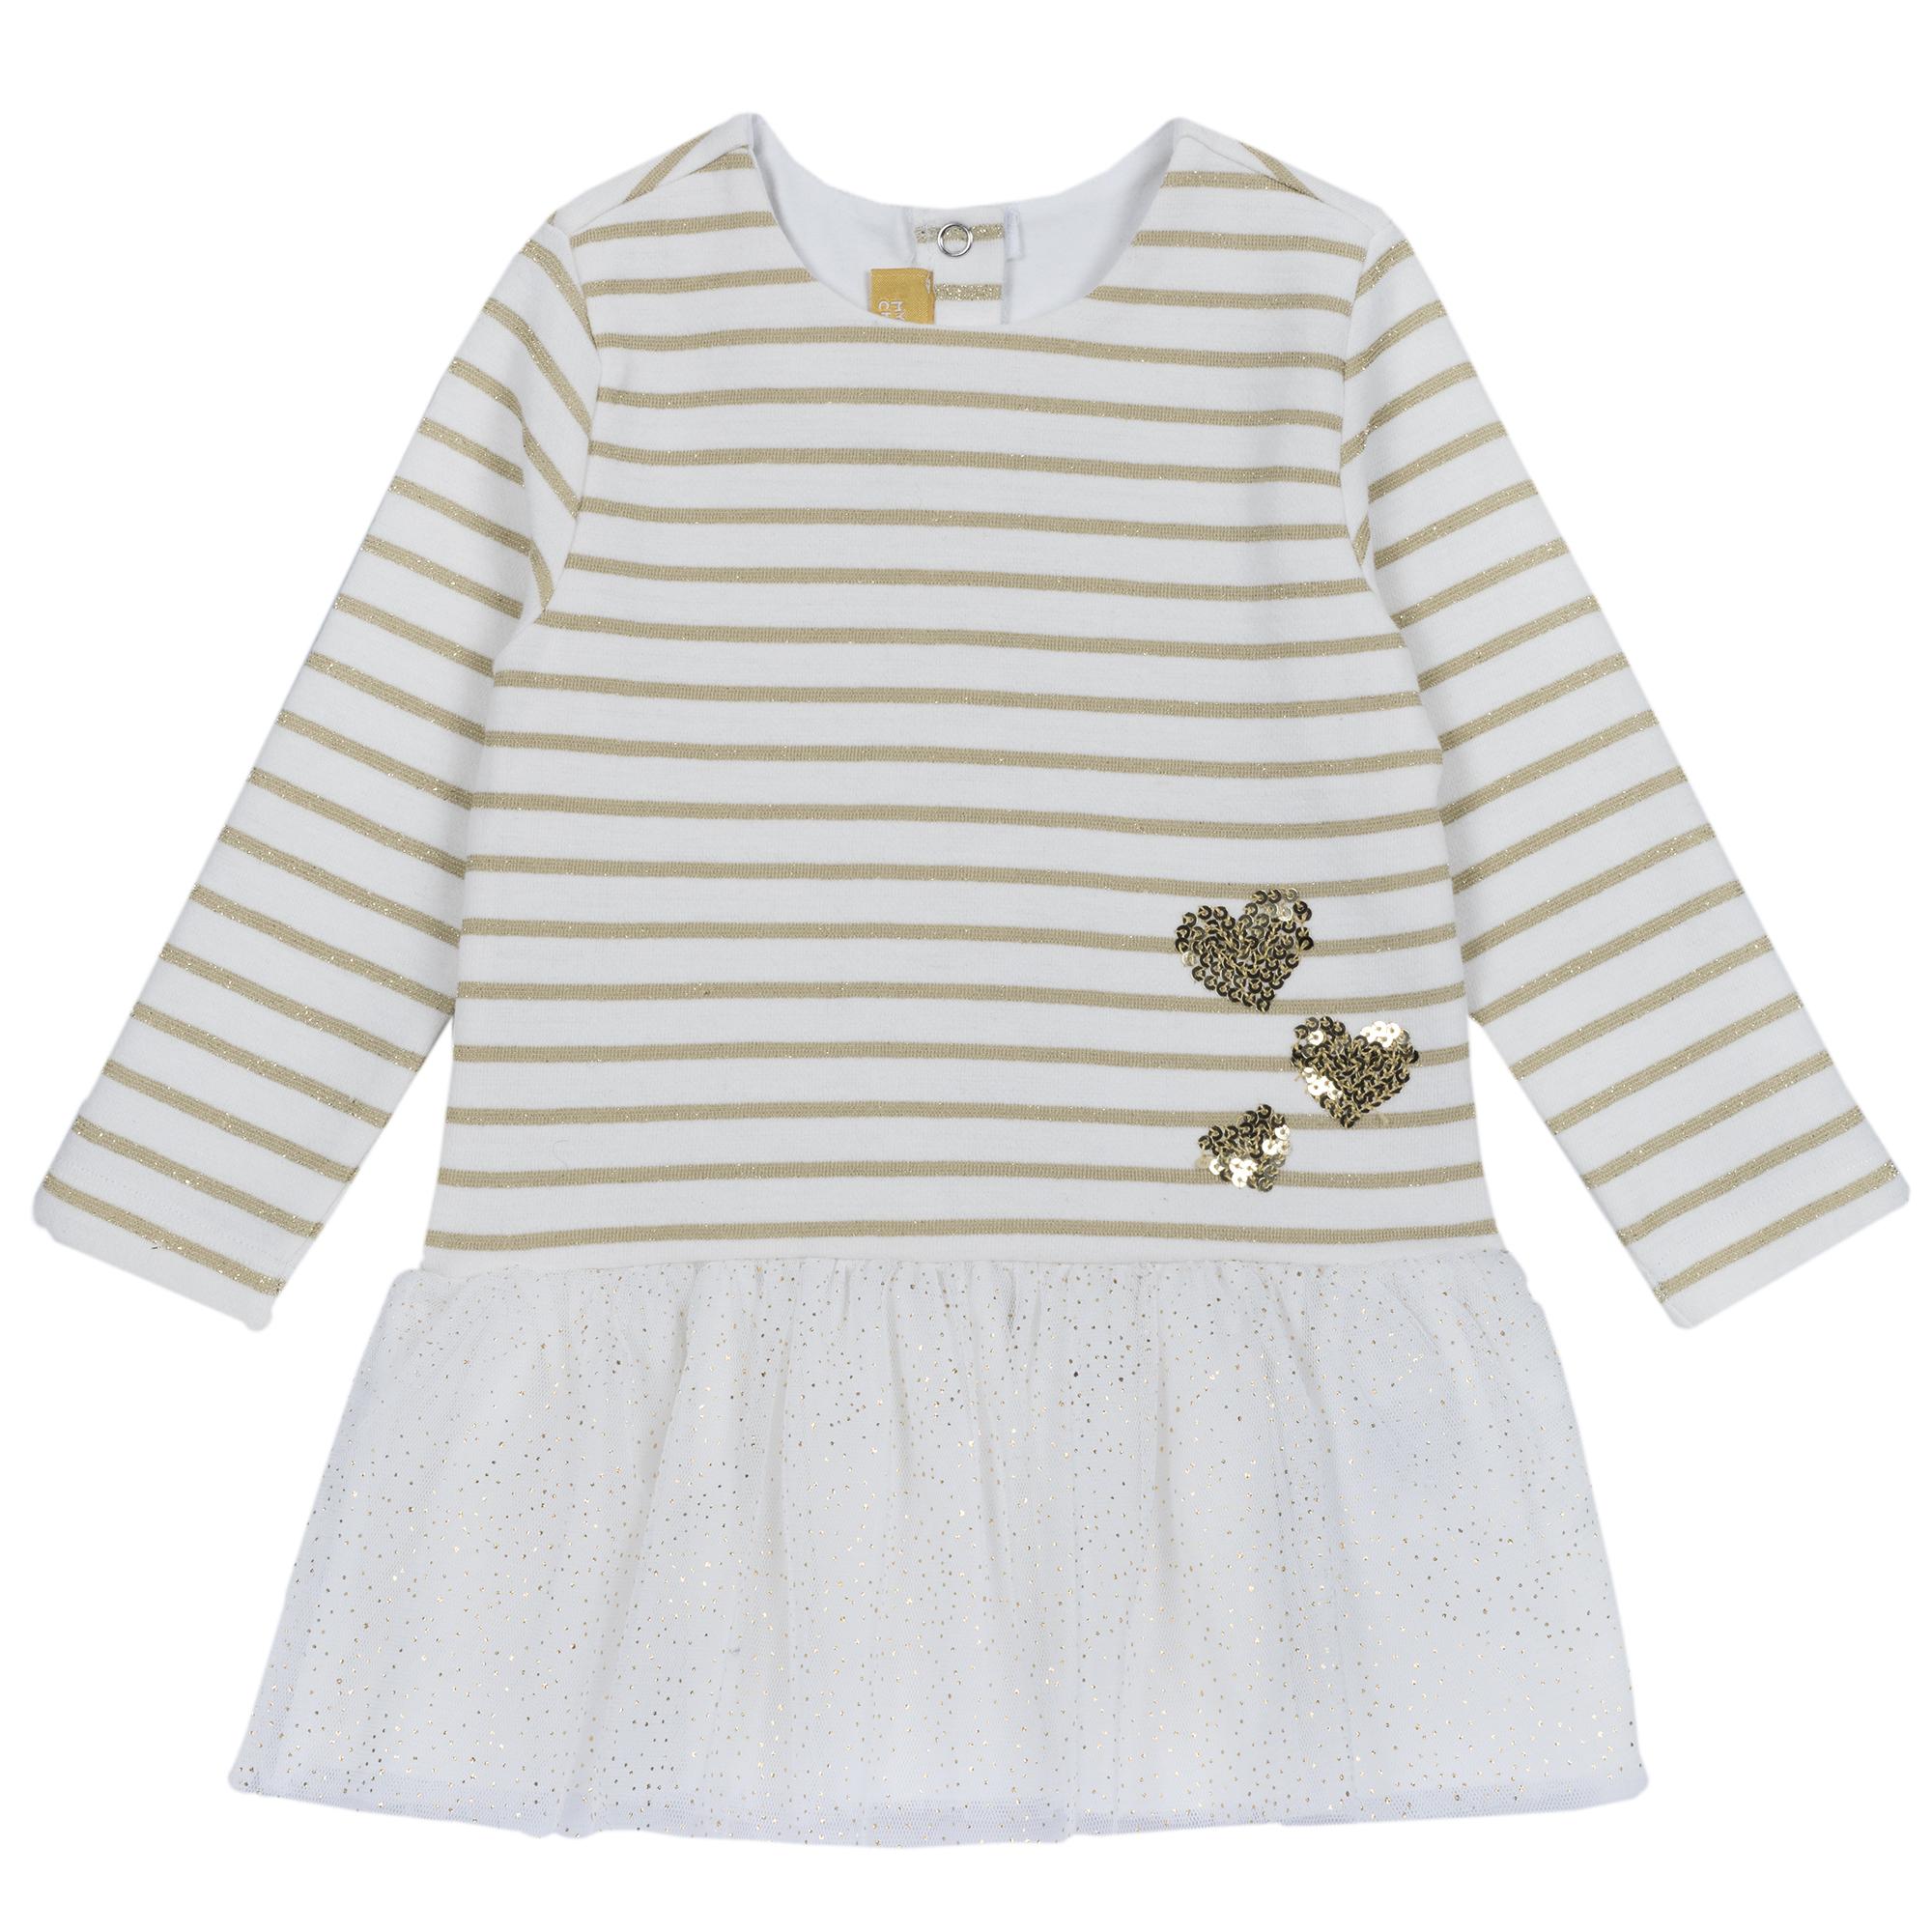 Rochie copii Chicco, alb